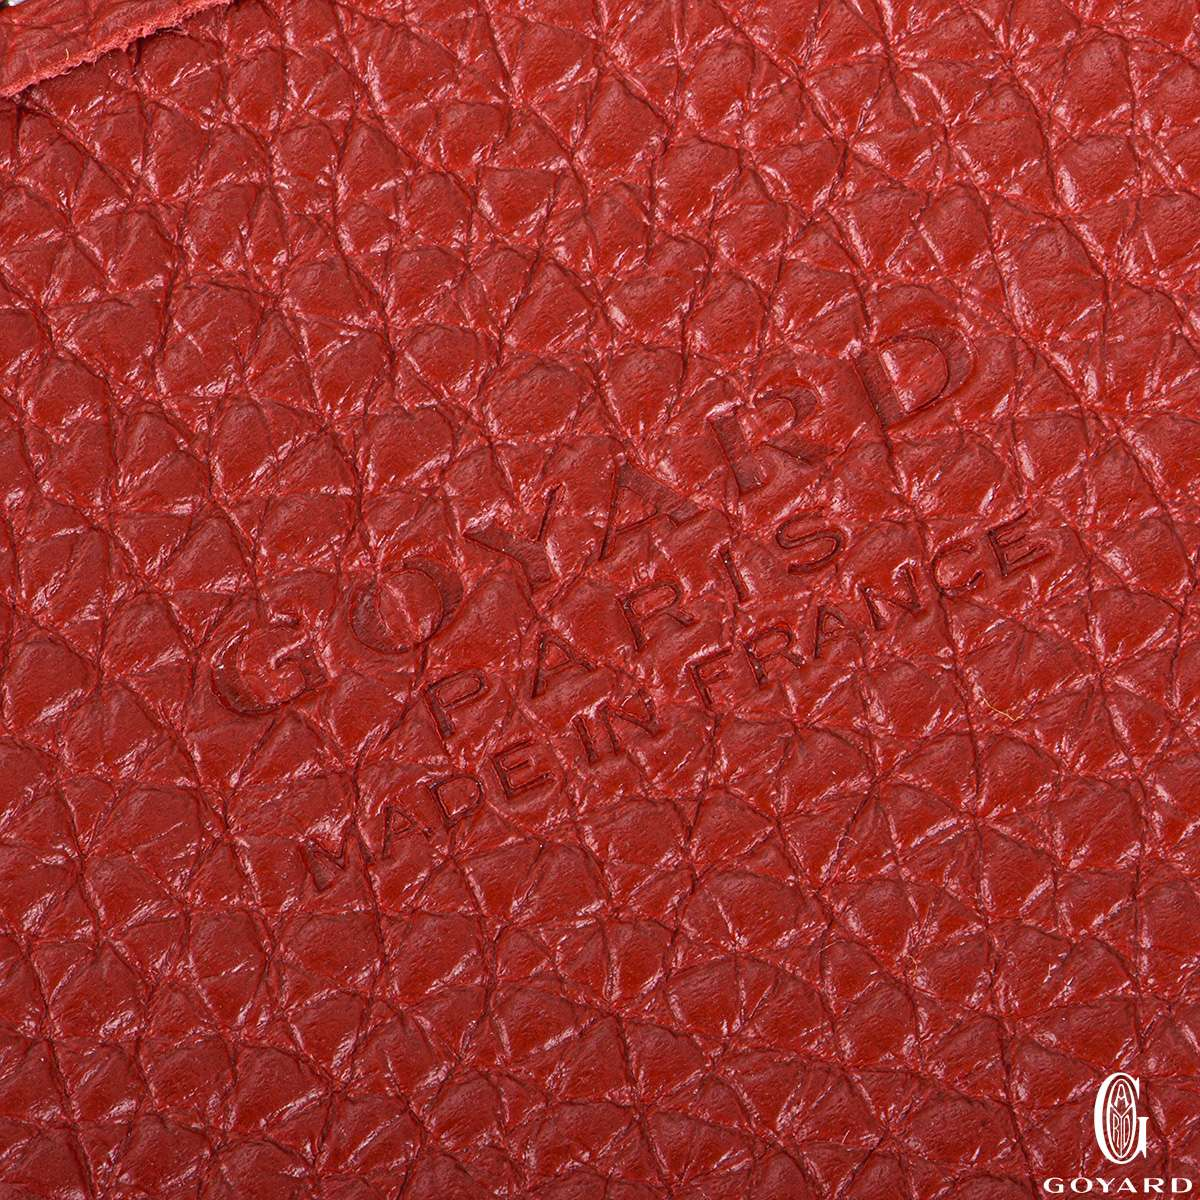 Goyard Red Goyardine Canvas Sac Hardy PM Tote Bag